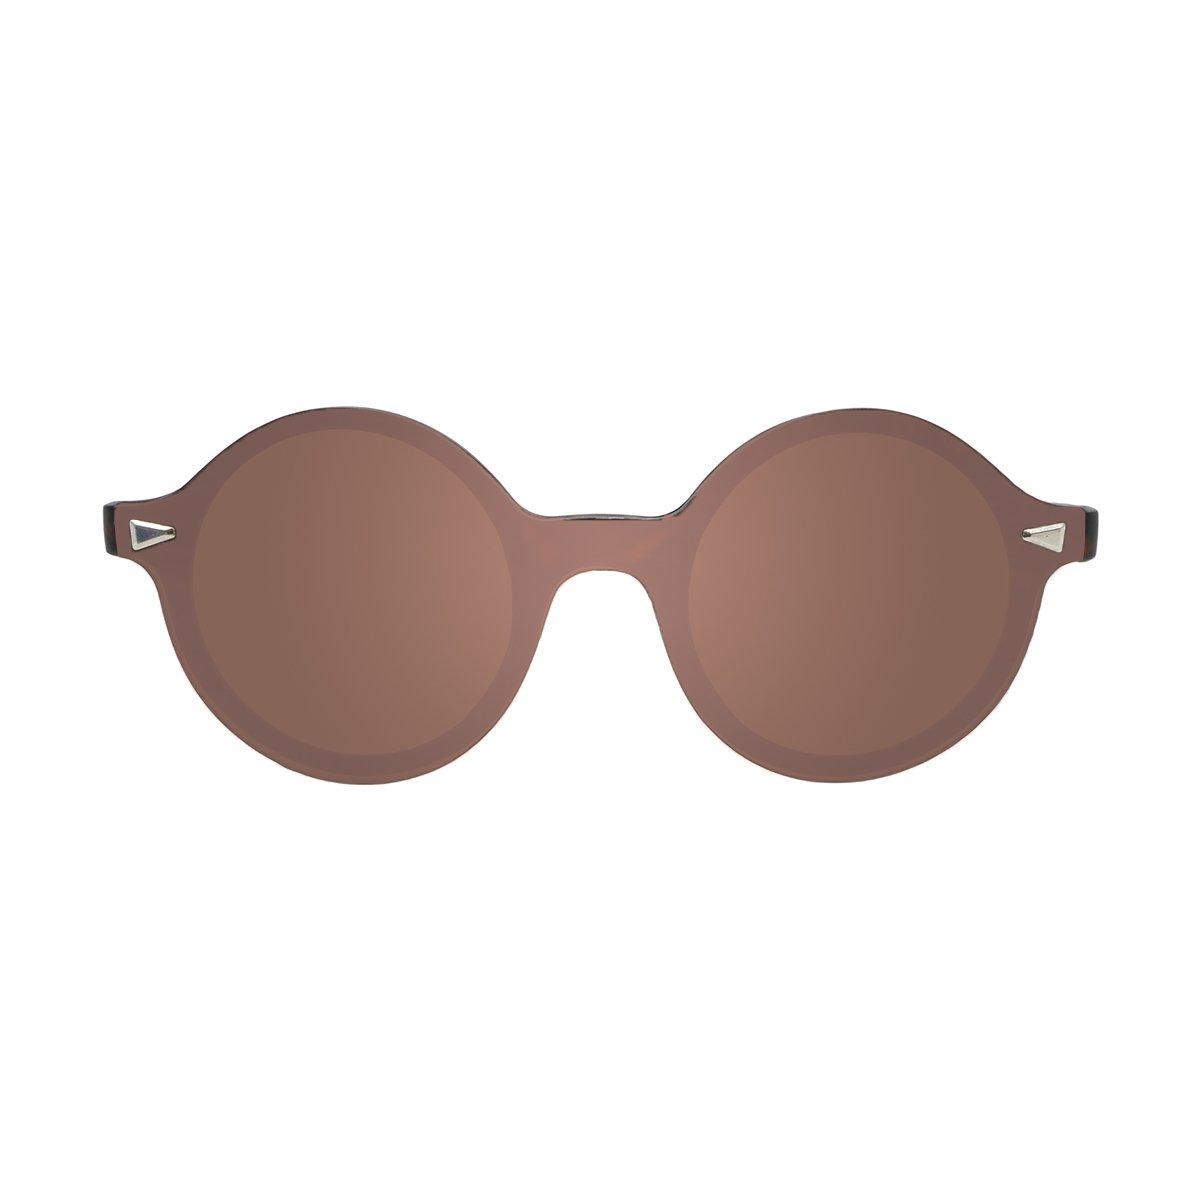 Paloalto Sunglasses p4000.12 Gafas de Sol Unisex, Marrón ...